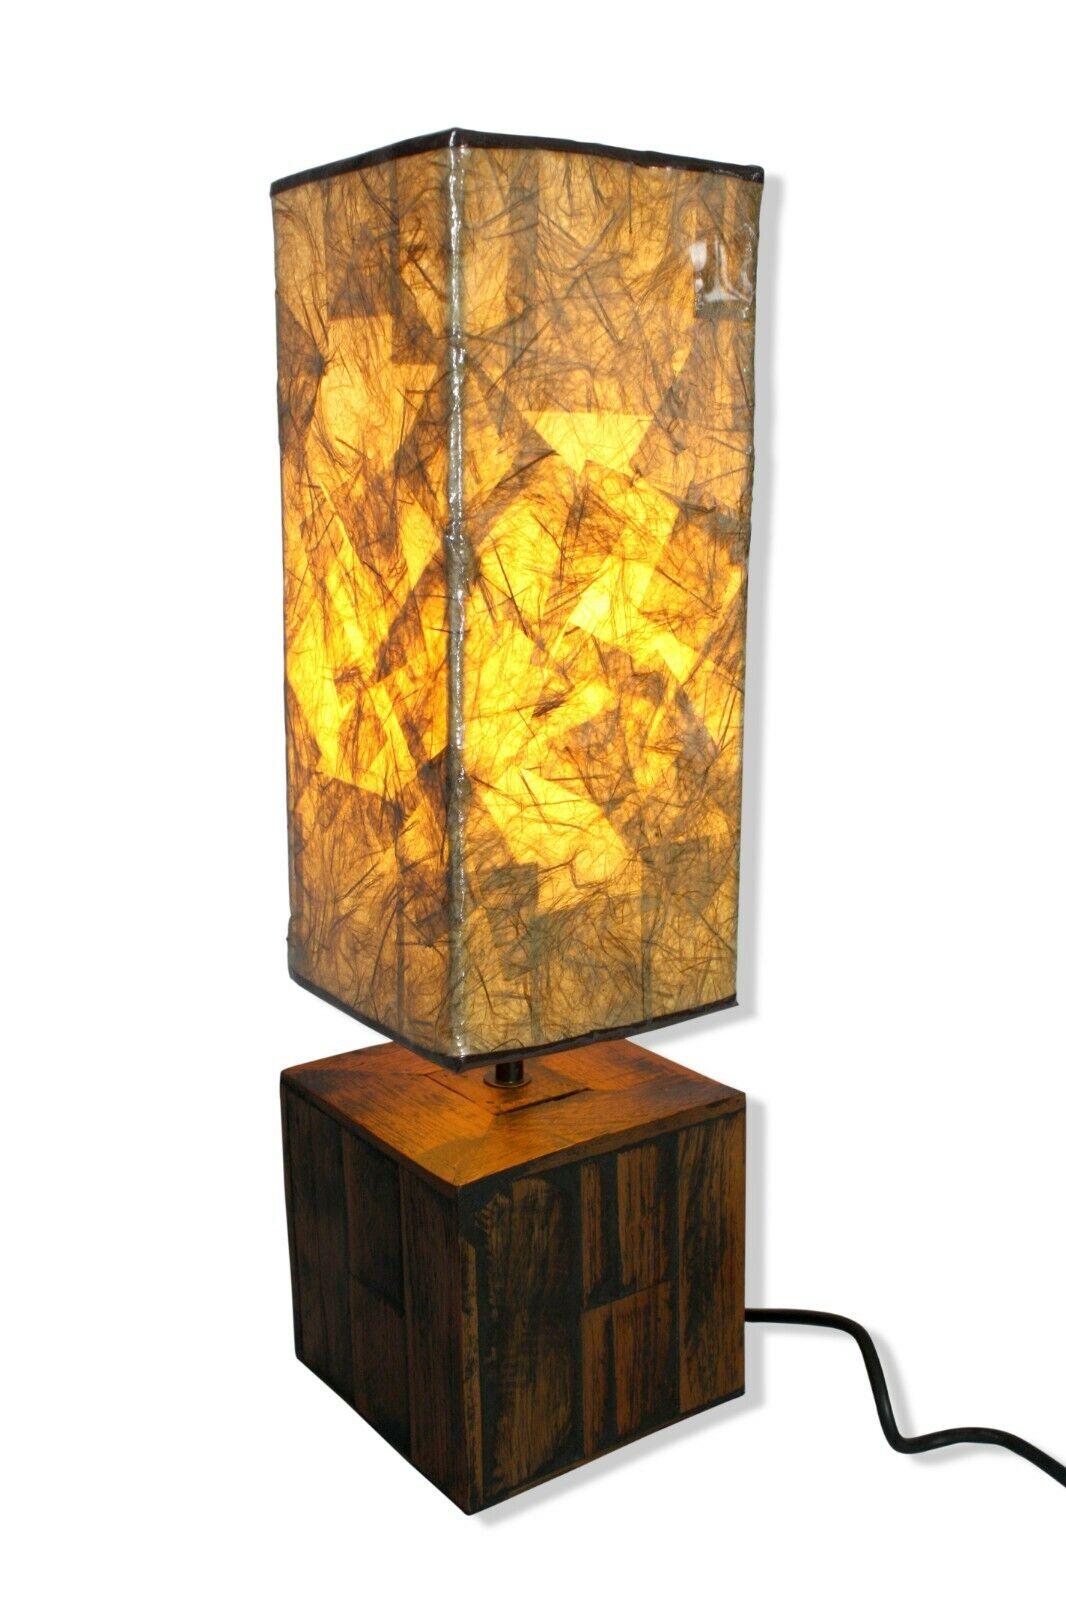 Natürlich Thai Beleuchtung Teakholz Basis Lampe. 54cm.Tatami Lampenschirm Modern